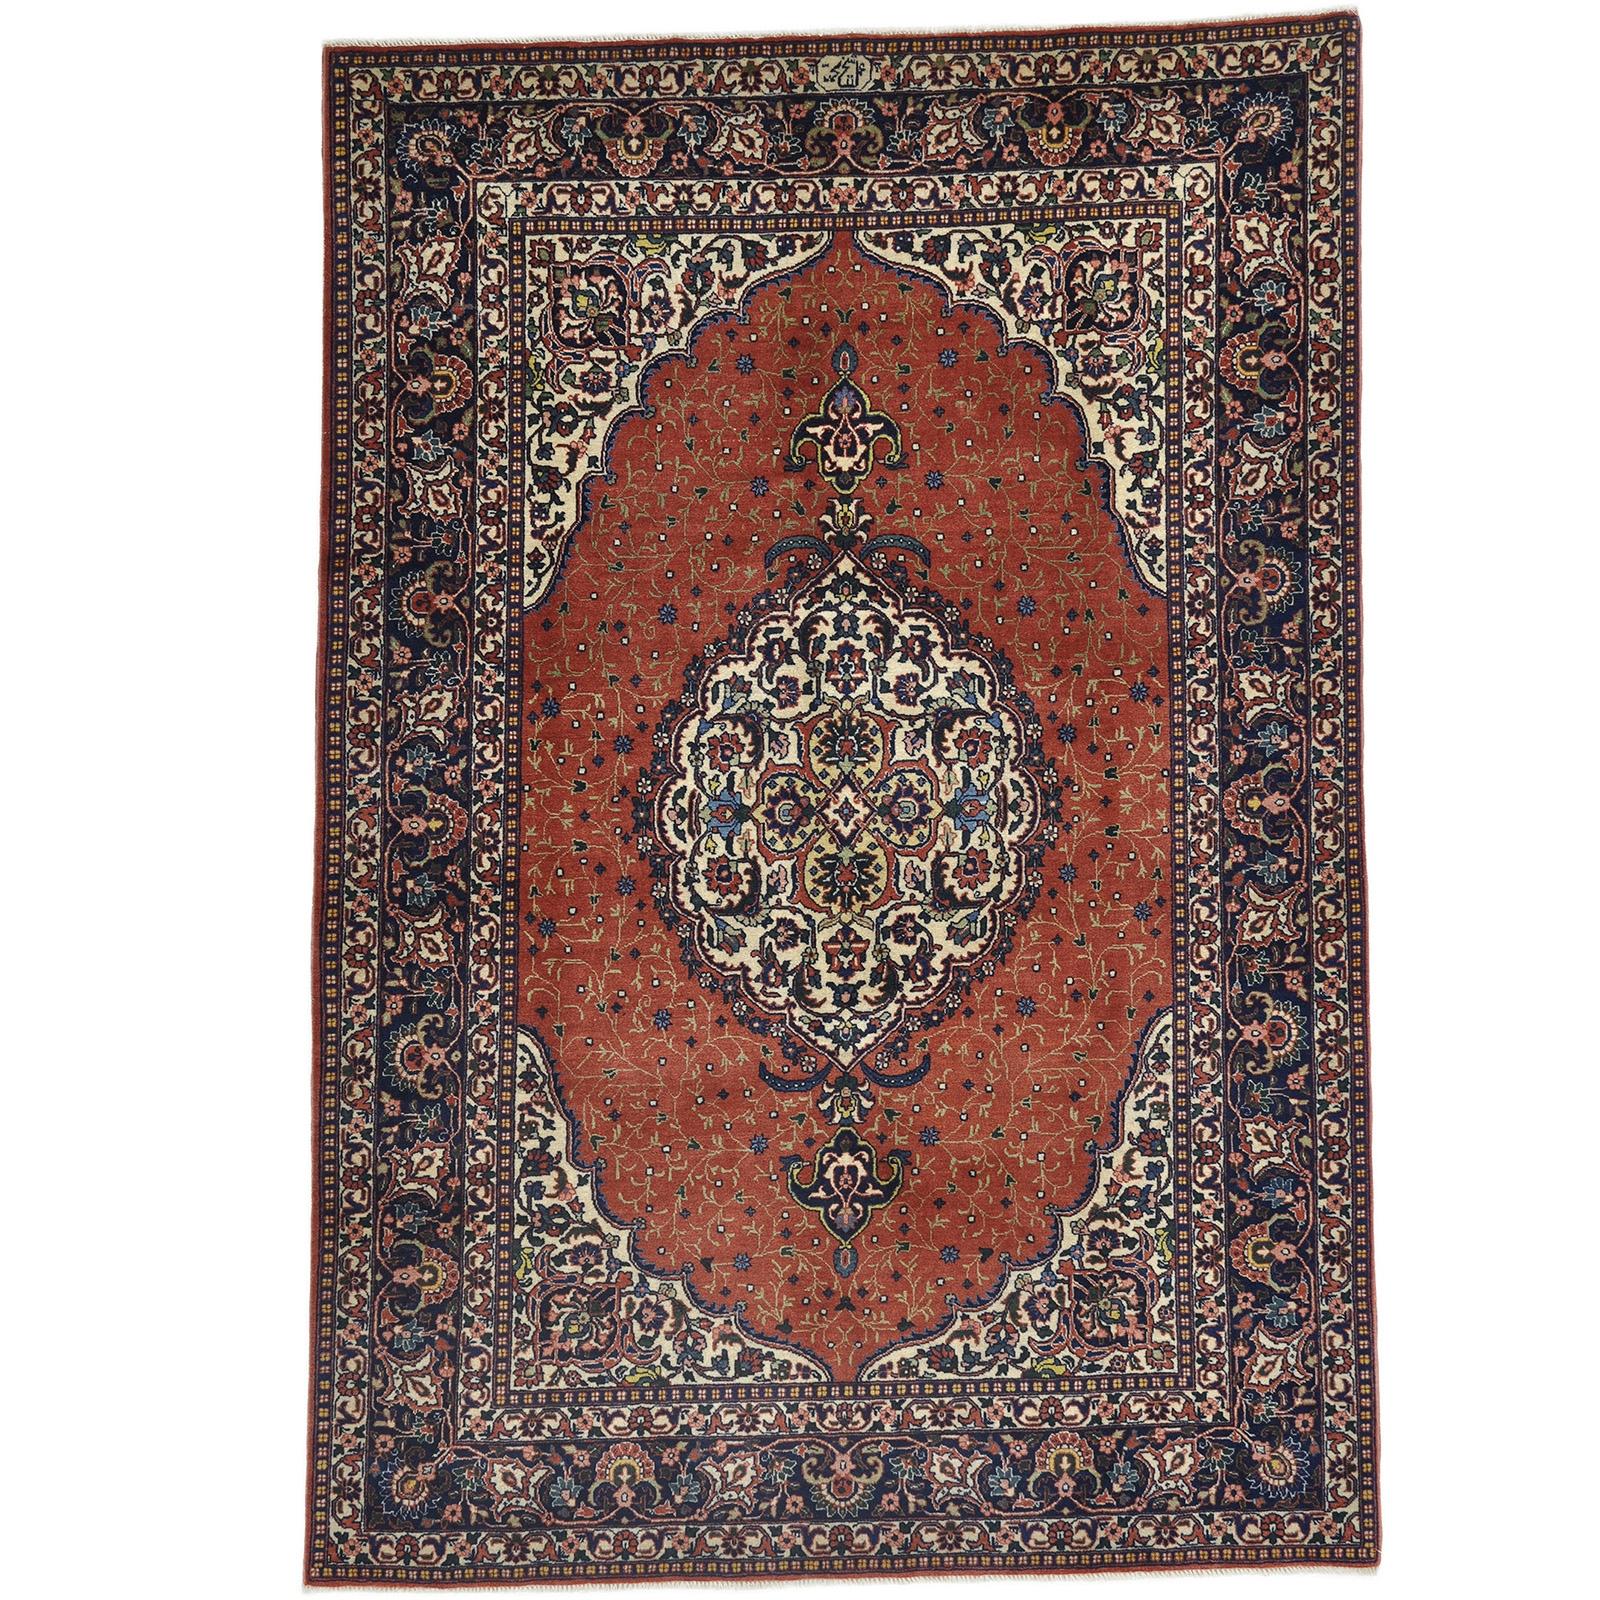 Täbriz (Semi Antik 40 Raj) matta storlek 198x138 cm